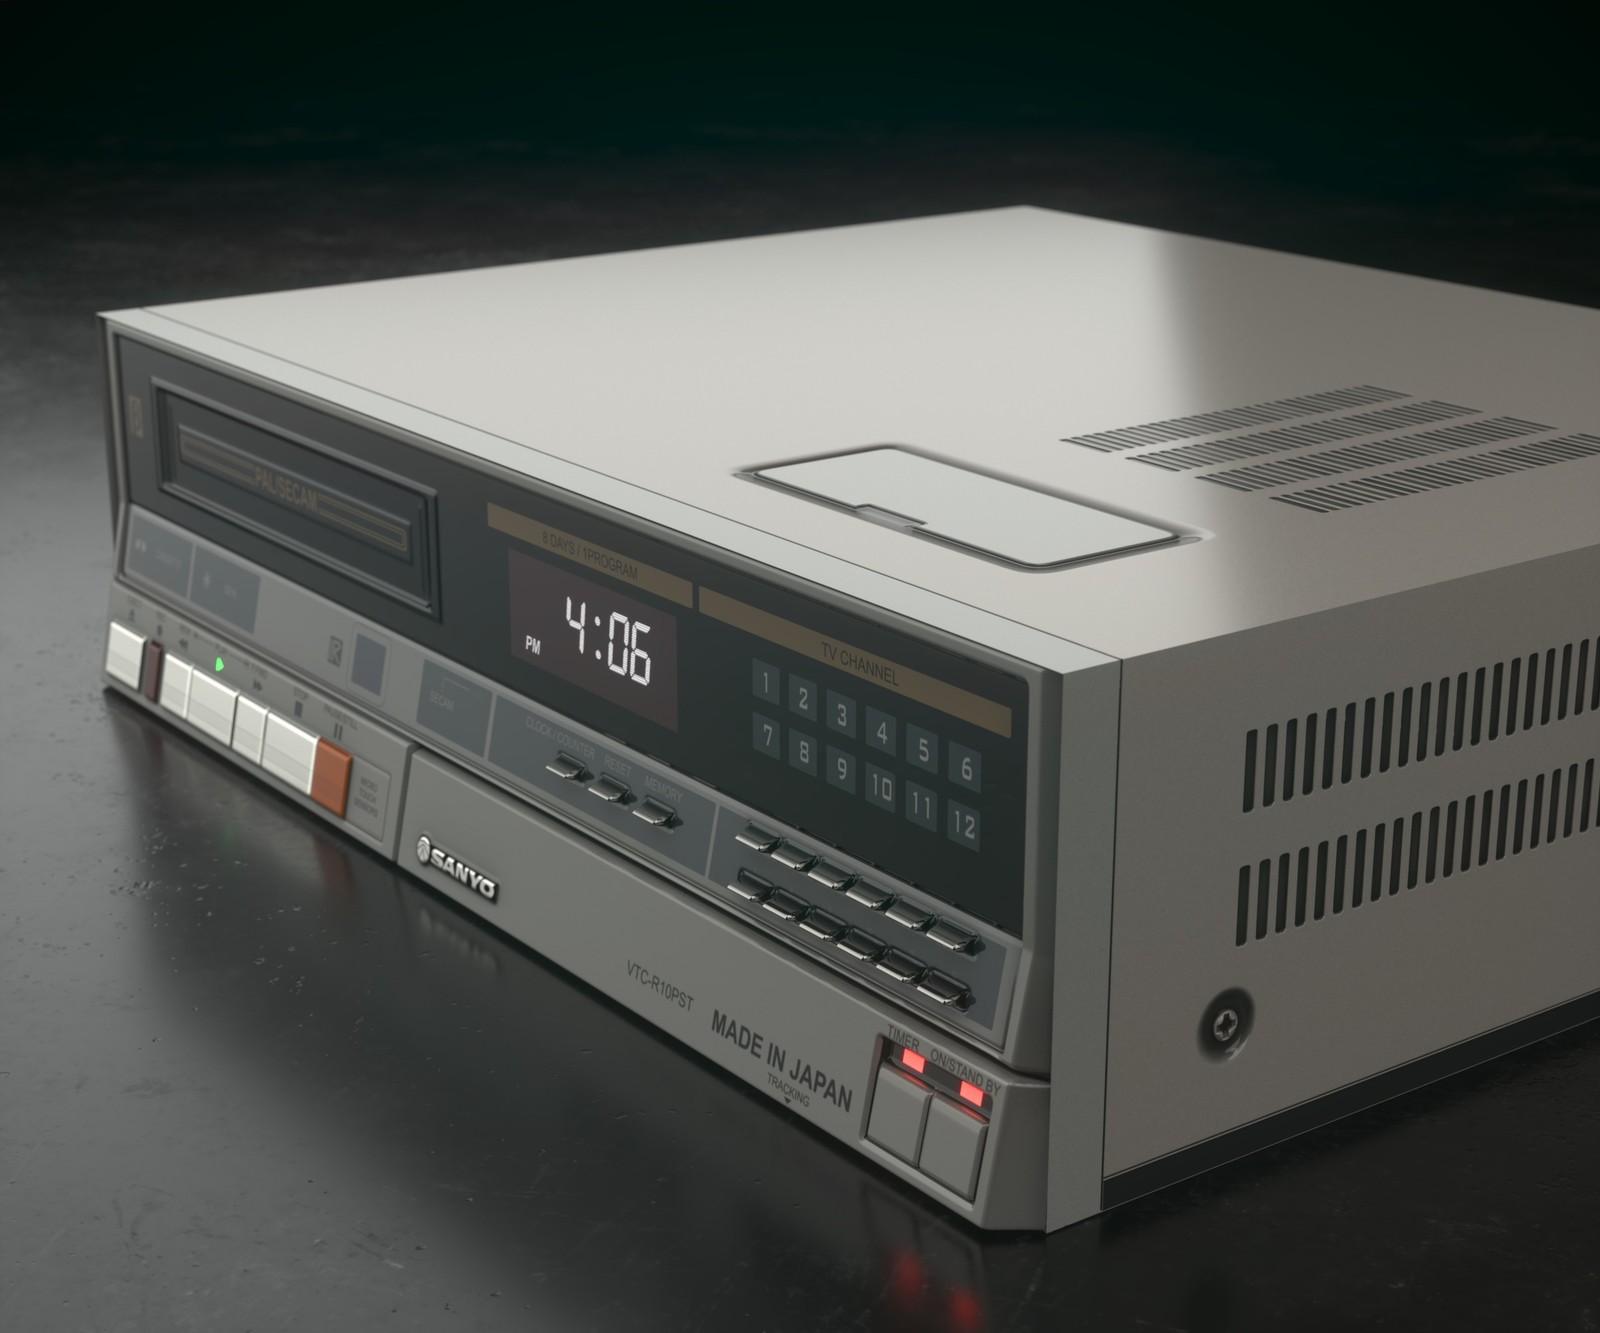 Sanyo Betamax VCR - Substance Modeling